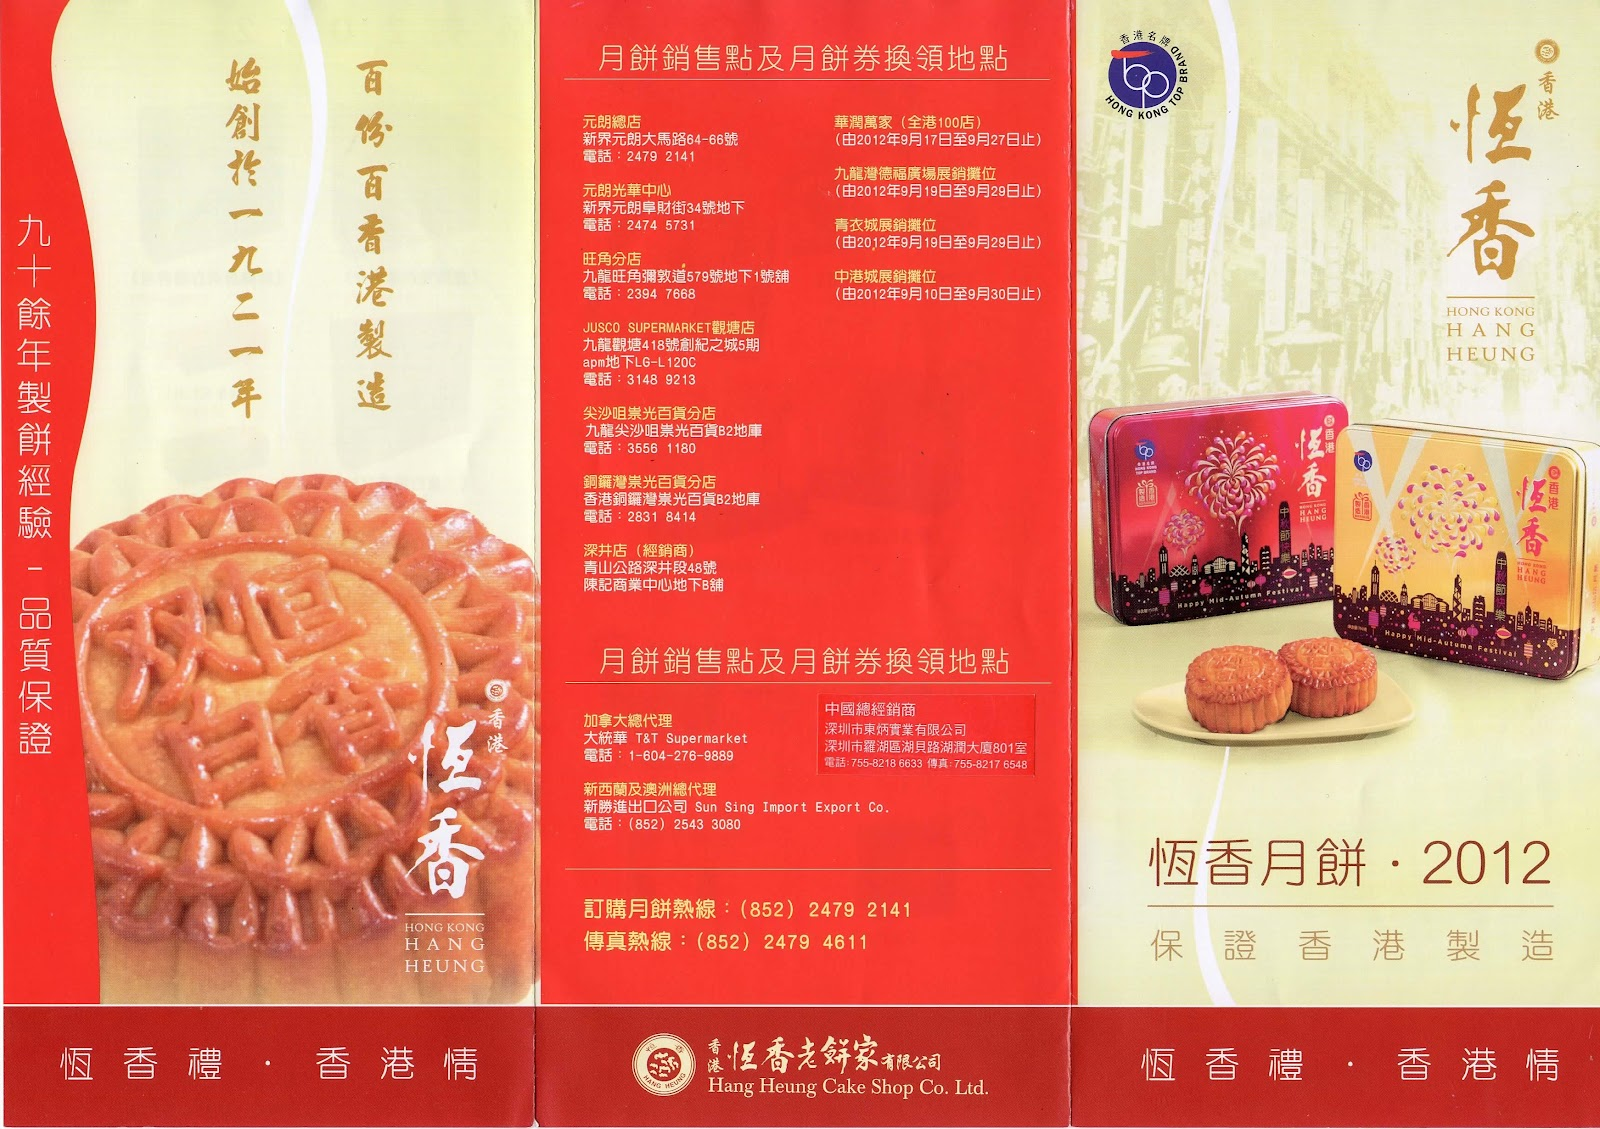 香港中秋月餅 Hong Kong Moon Cake: 恆香老餅家 價錢表